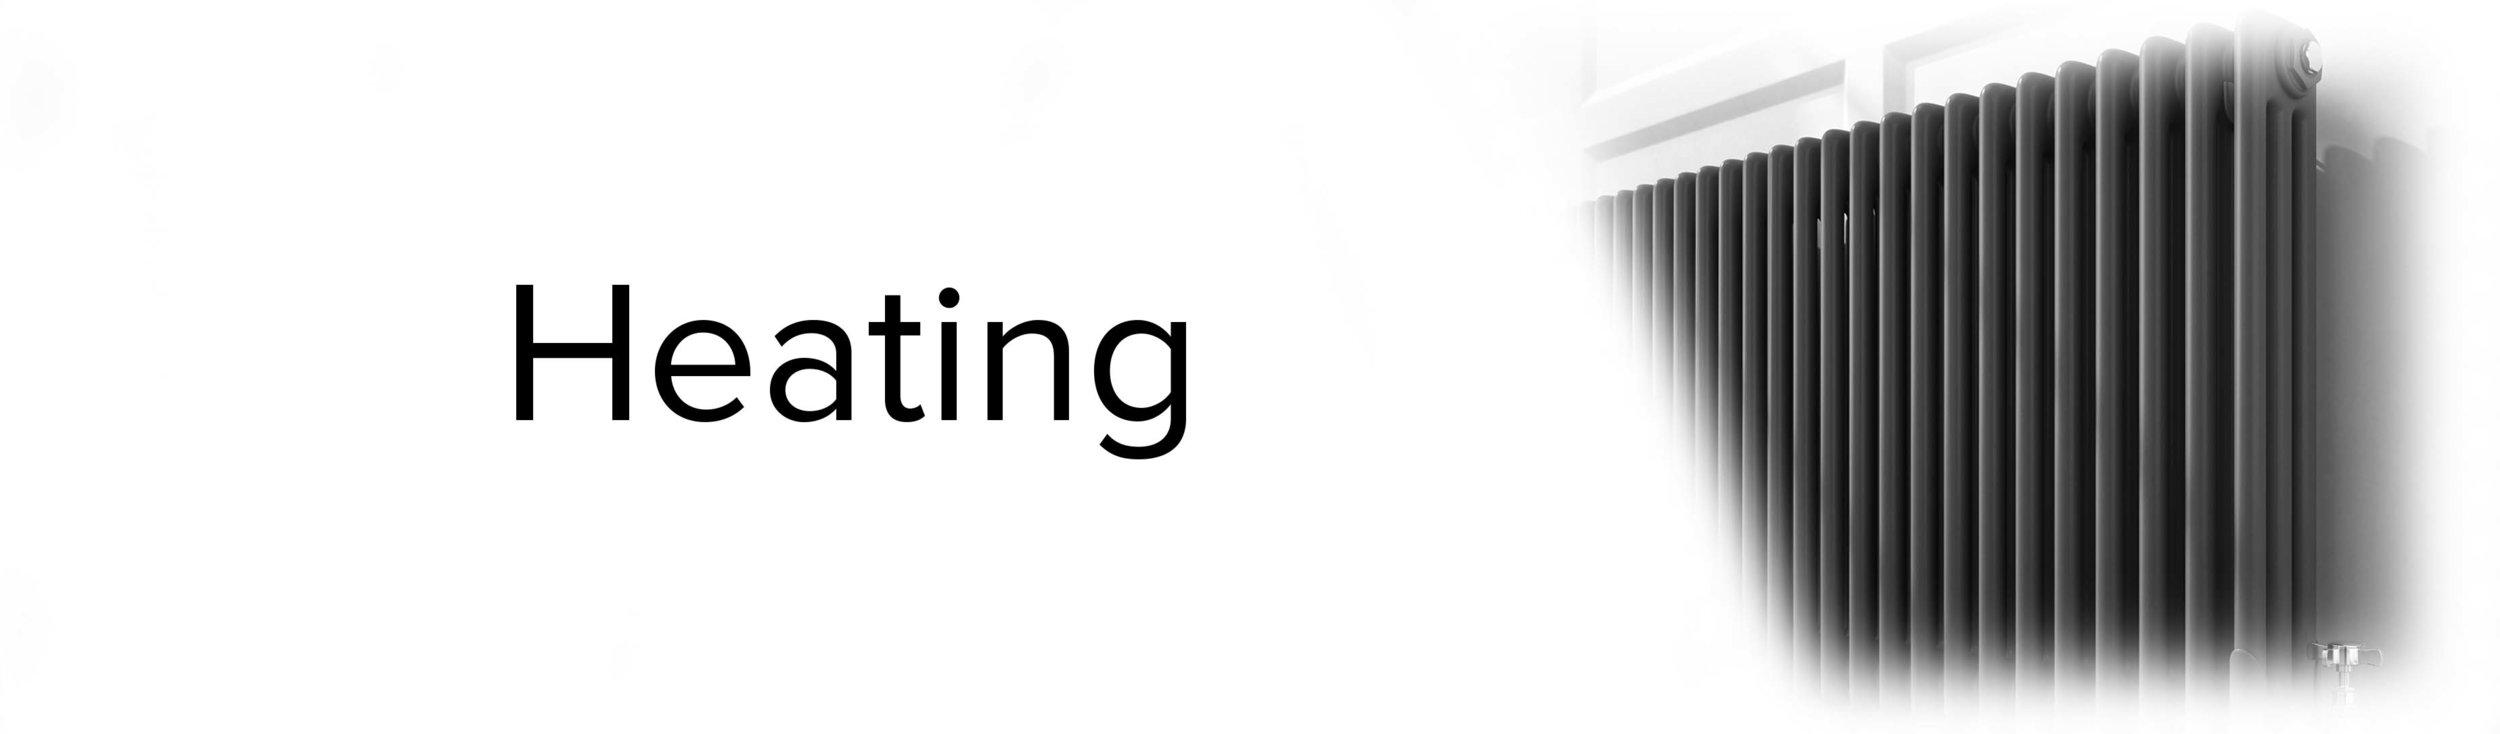 Heating.jpg